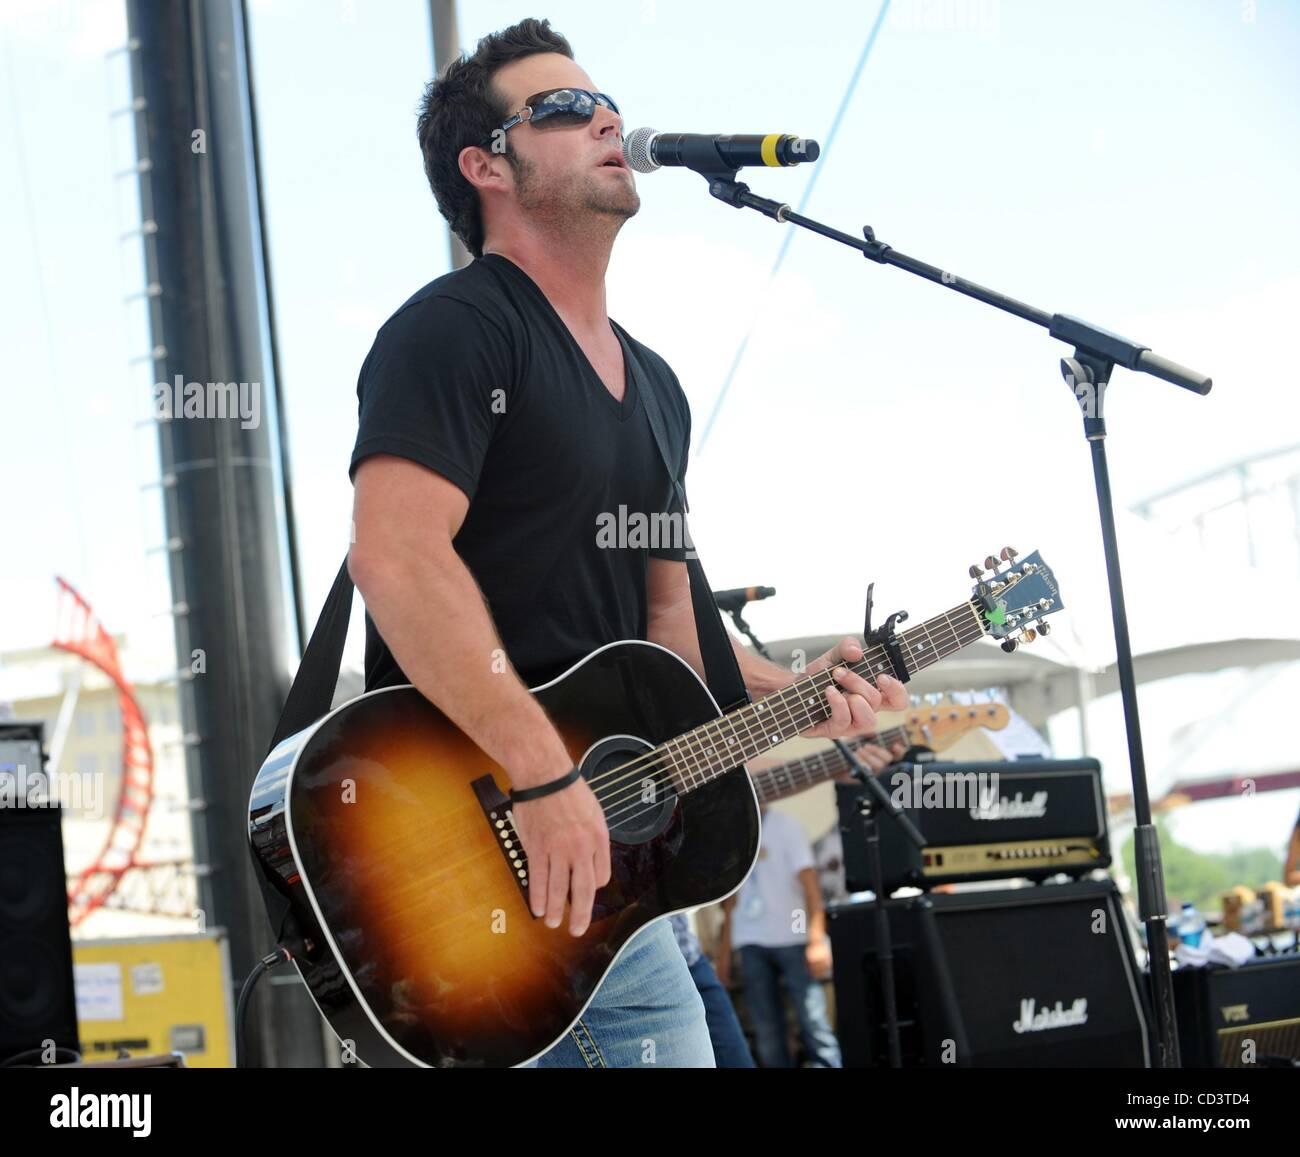 Jun 05, 2008 - Nashville, Tennessee, USA - Musician DAVID NAIL Stock ...